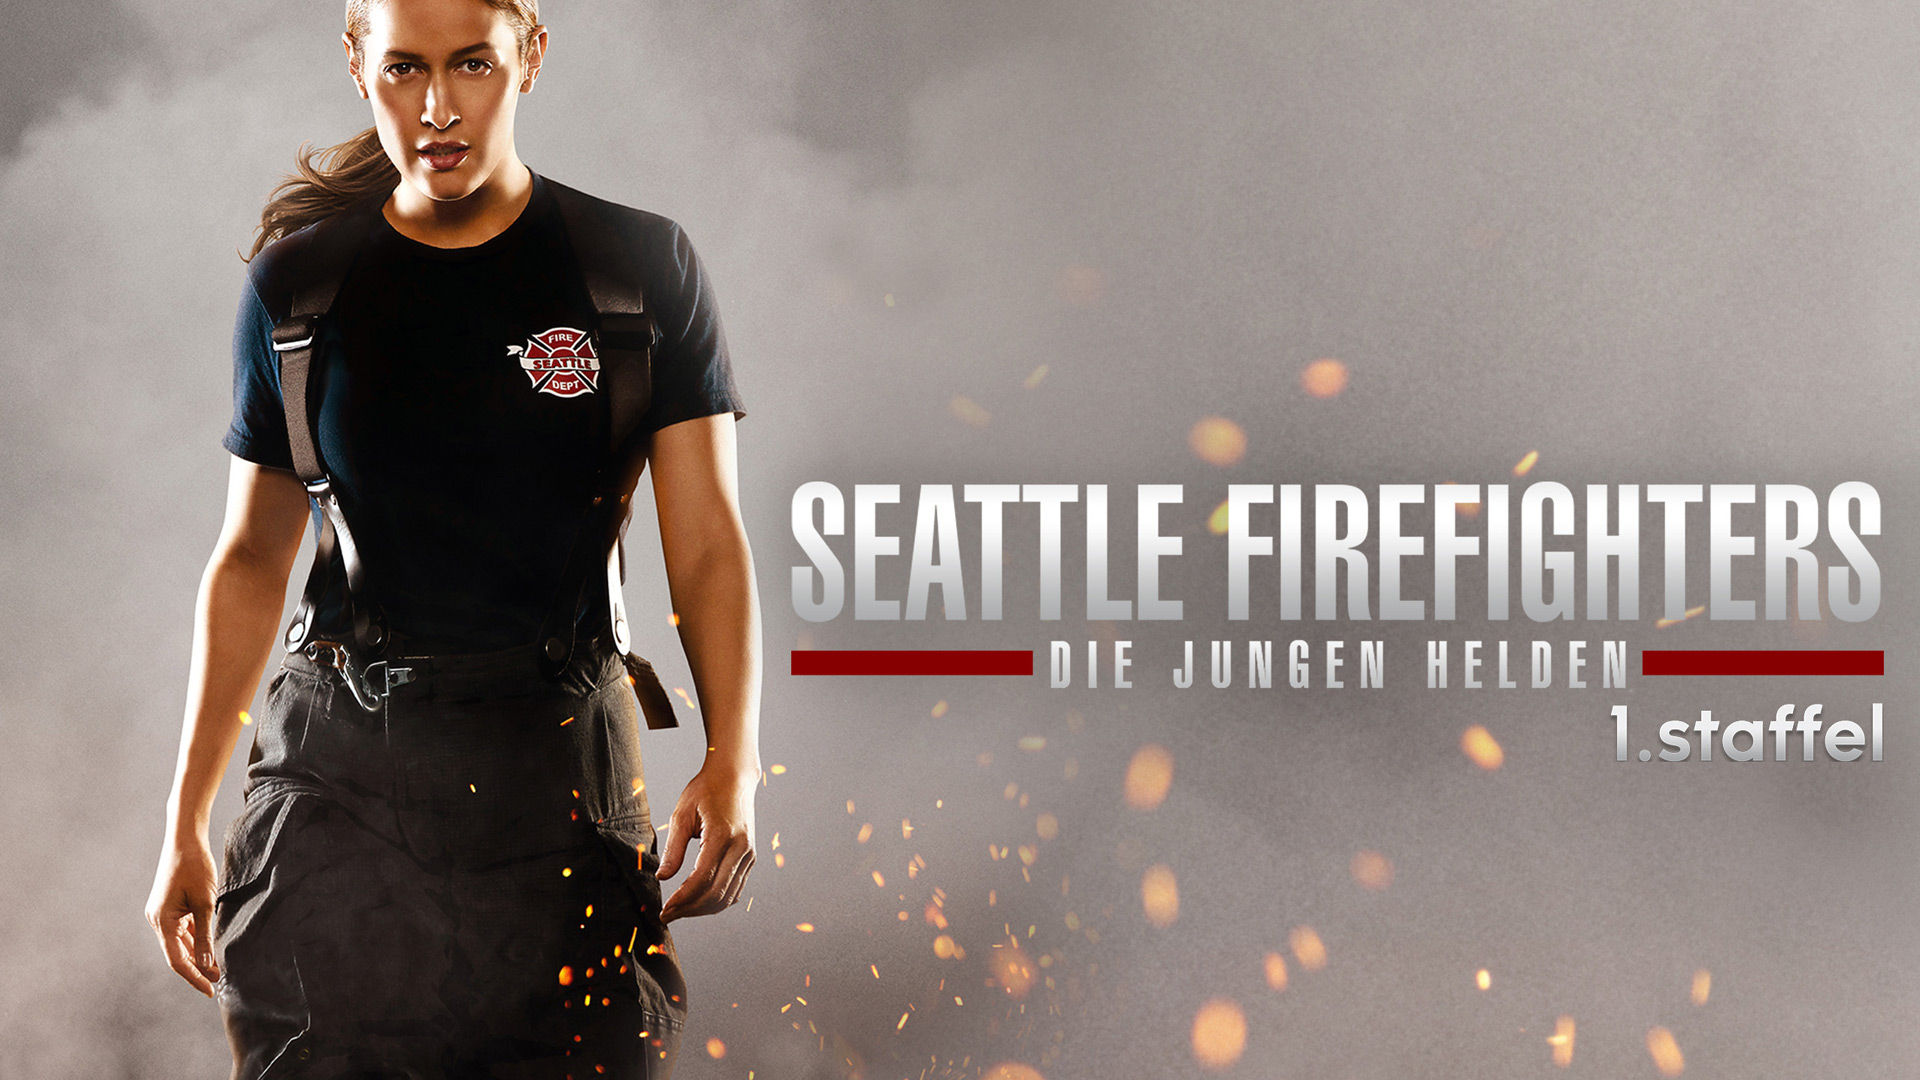 Seattle Firefighters – Die jungen Helden - Staffel 1 [dt./OV]